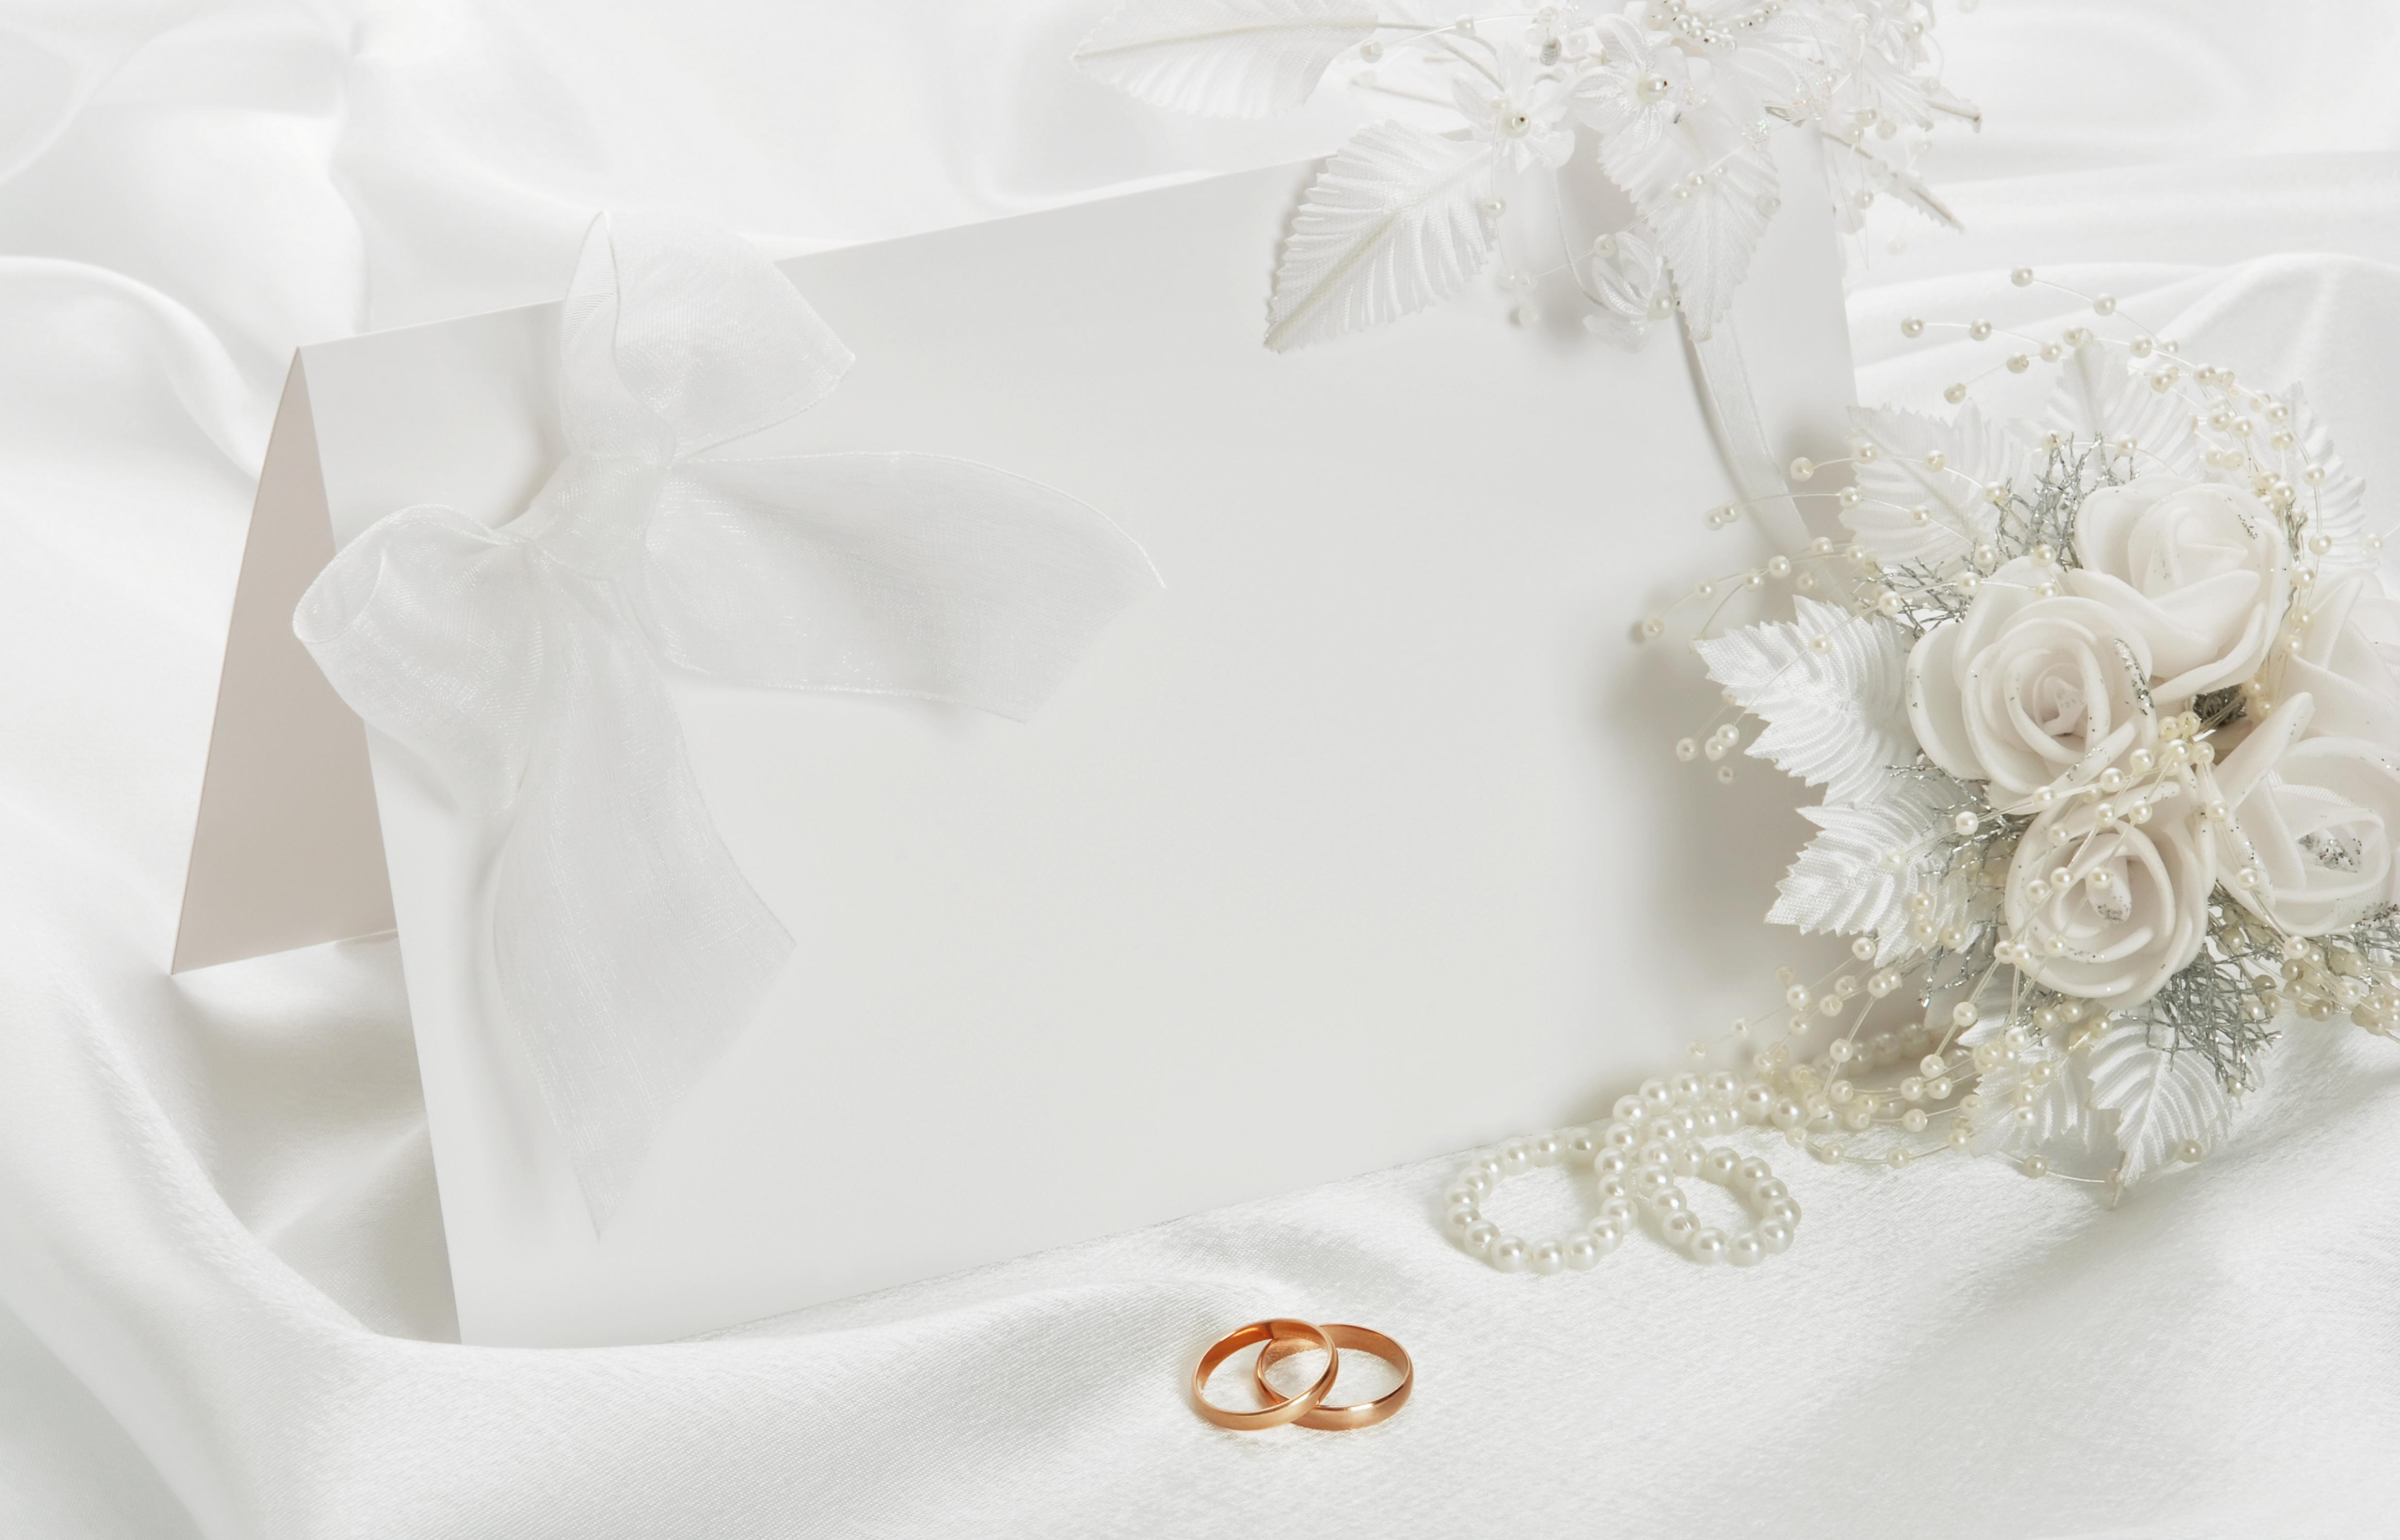 Elegant Wedding Wallpaper 4950x3176